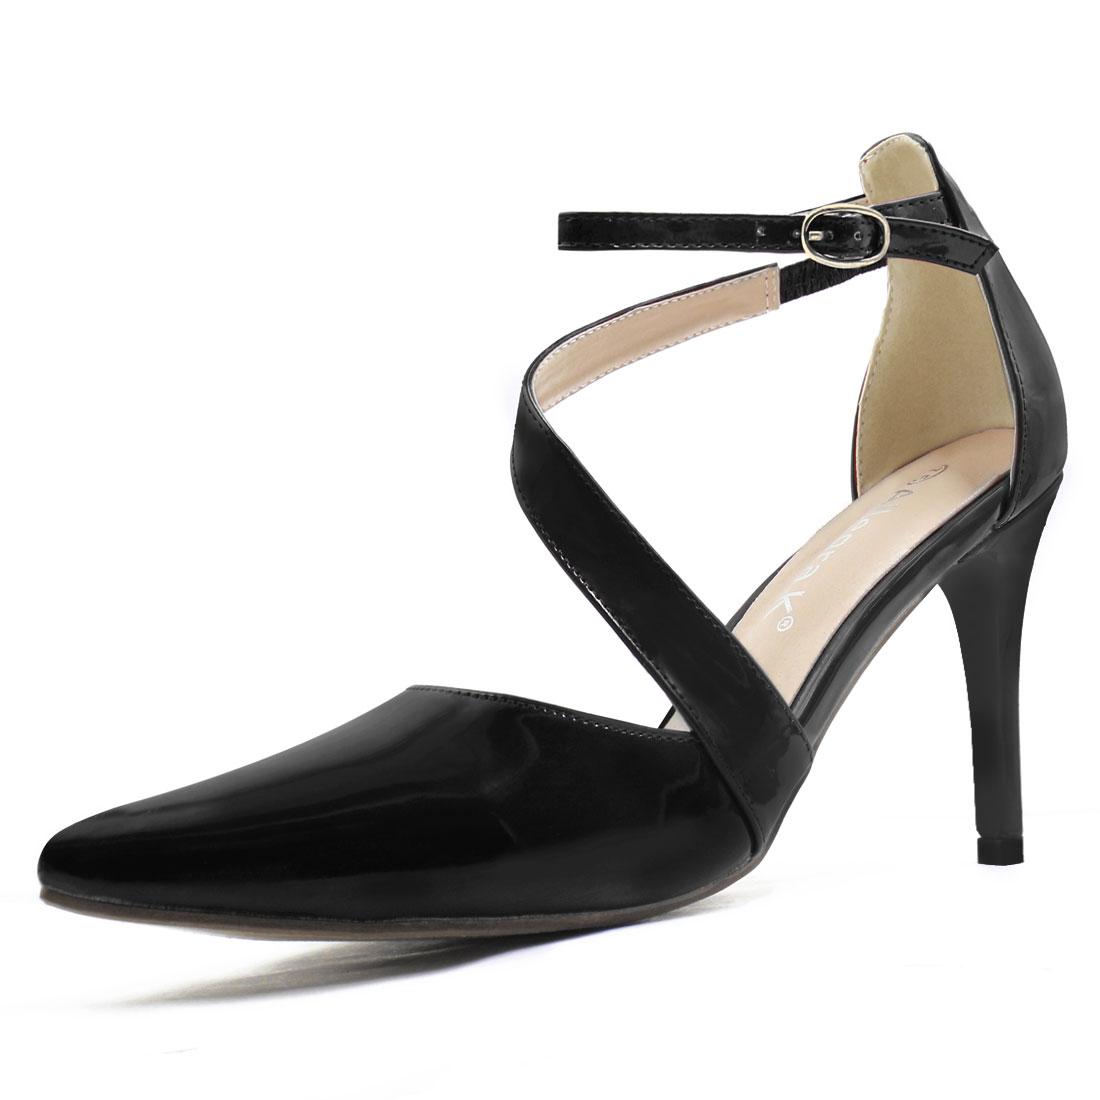 Women Asymmetrical Strap Stiletto Heel Pointy-Toe Pumps Black US 6.5